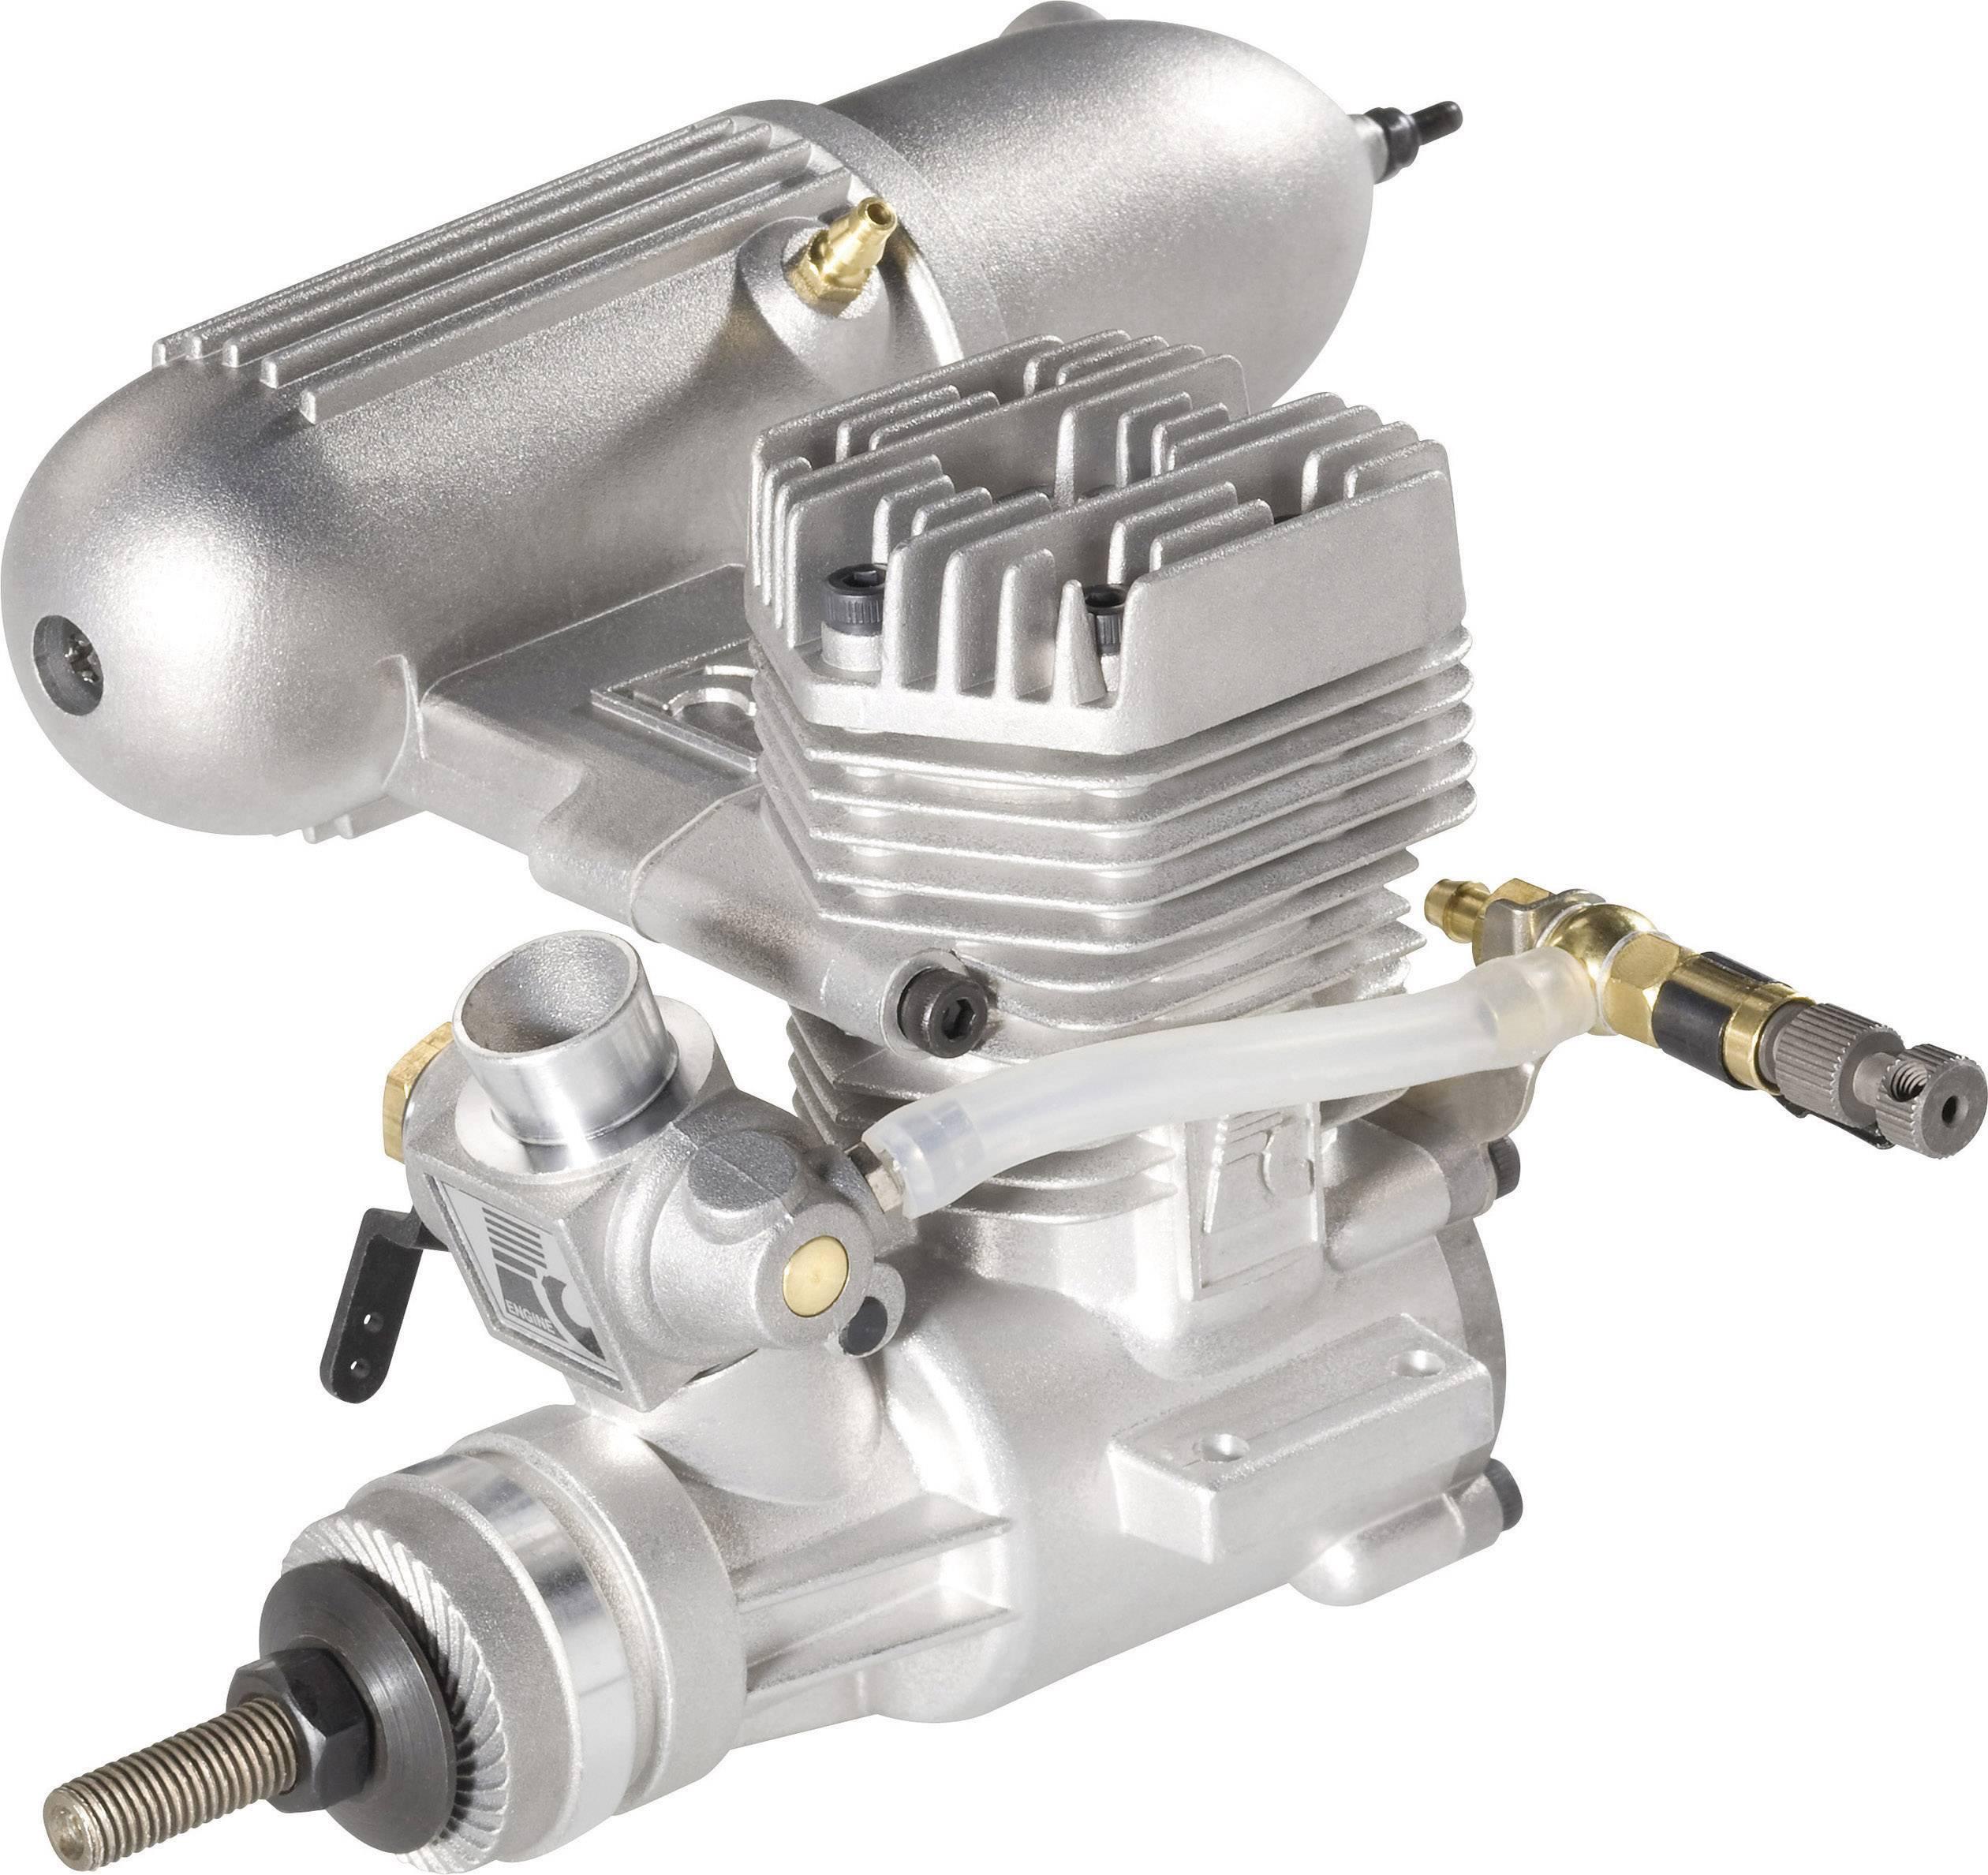 Spalovací motor letadla Force Engine EC-46F, 7,54 cm3, 1,19 kW